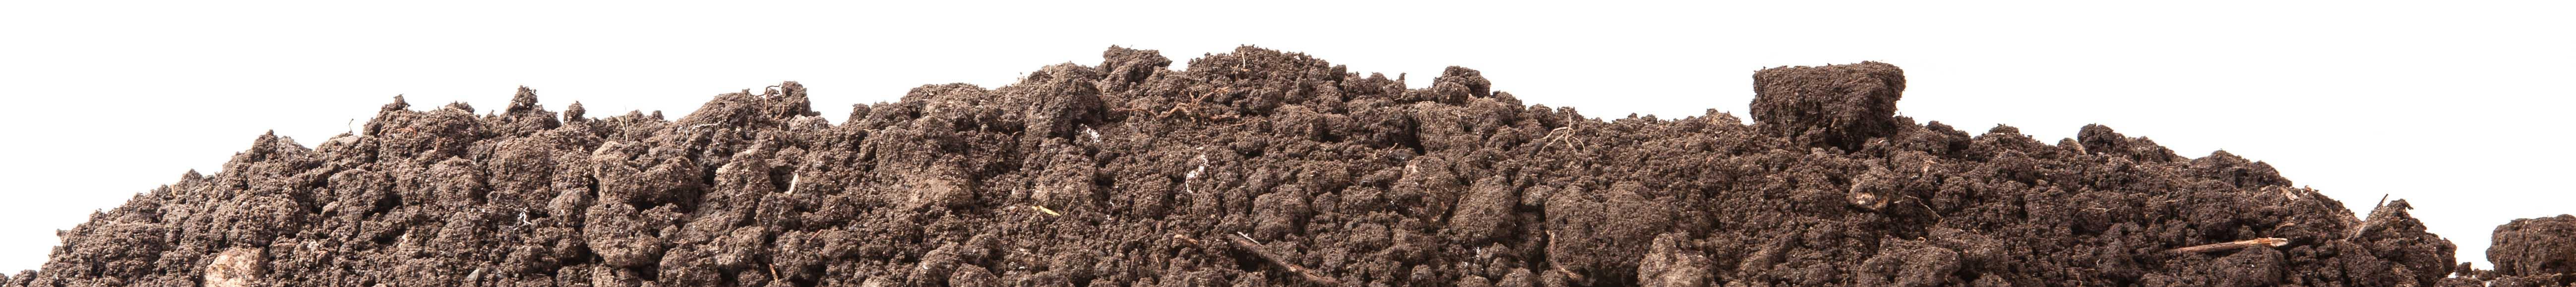 Pipelining Soil